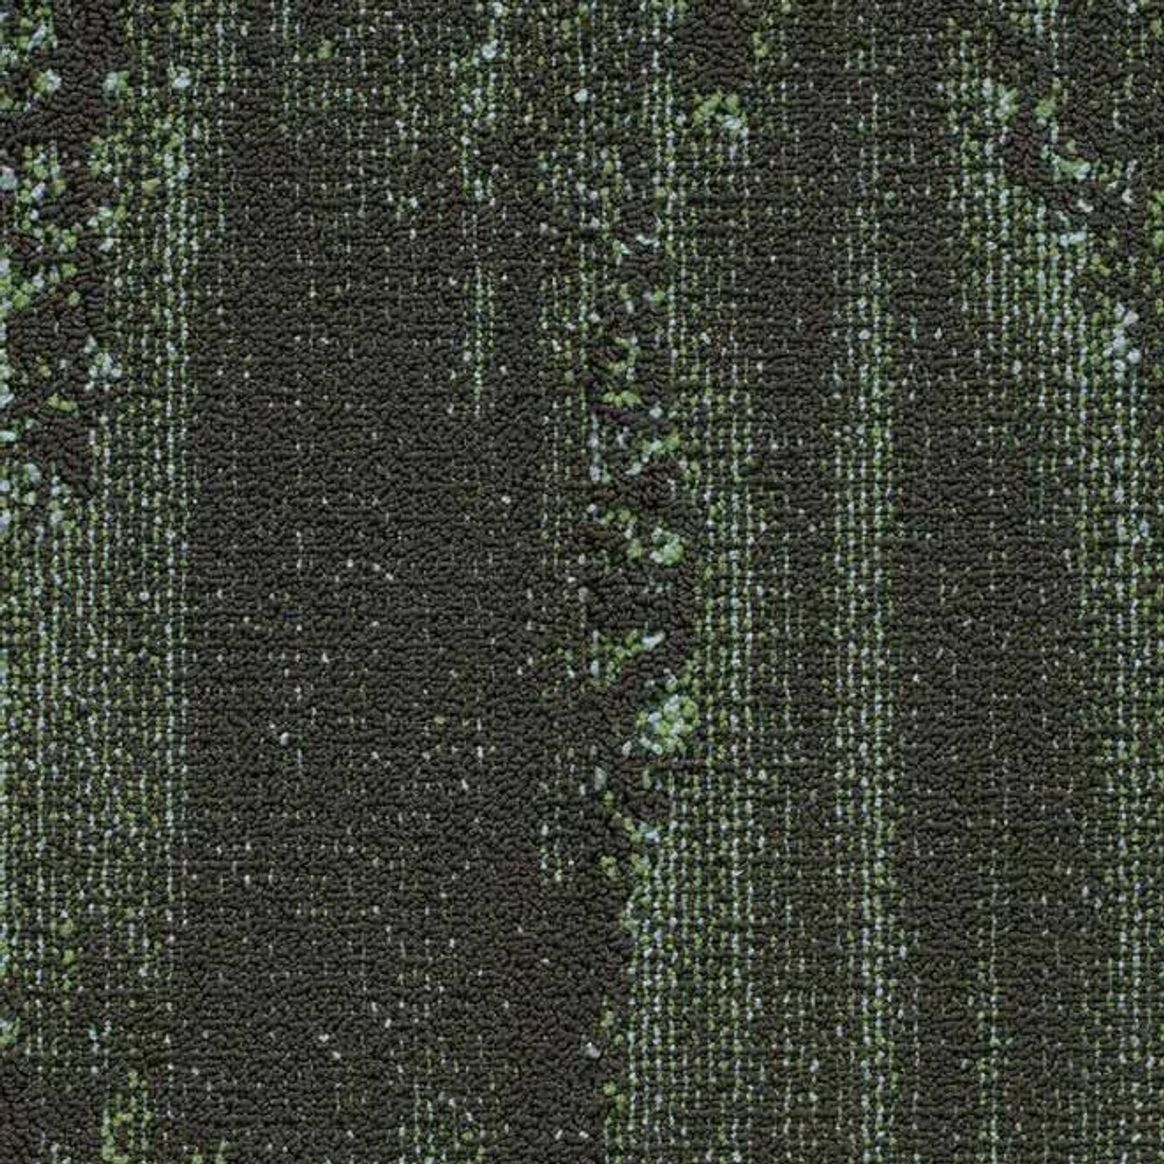 Greenery thumbnail